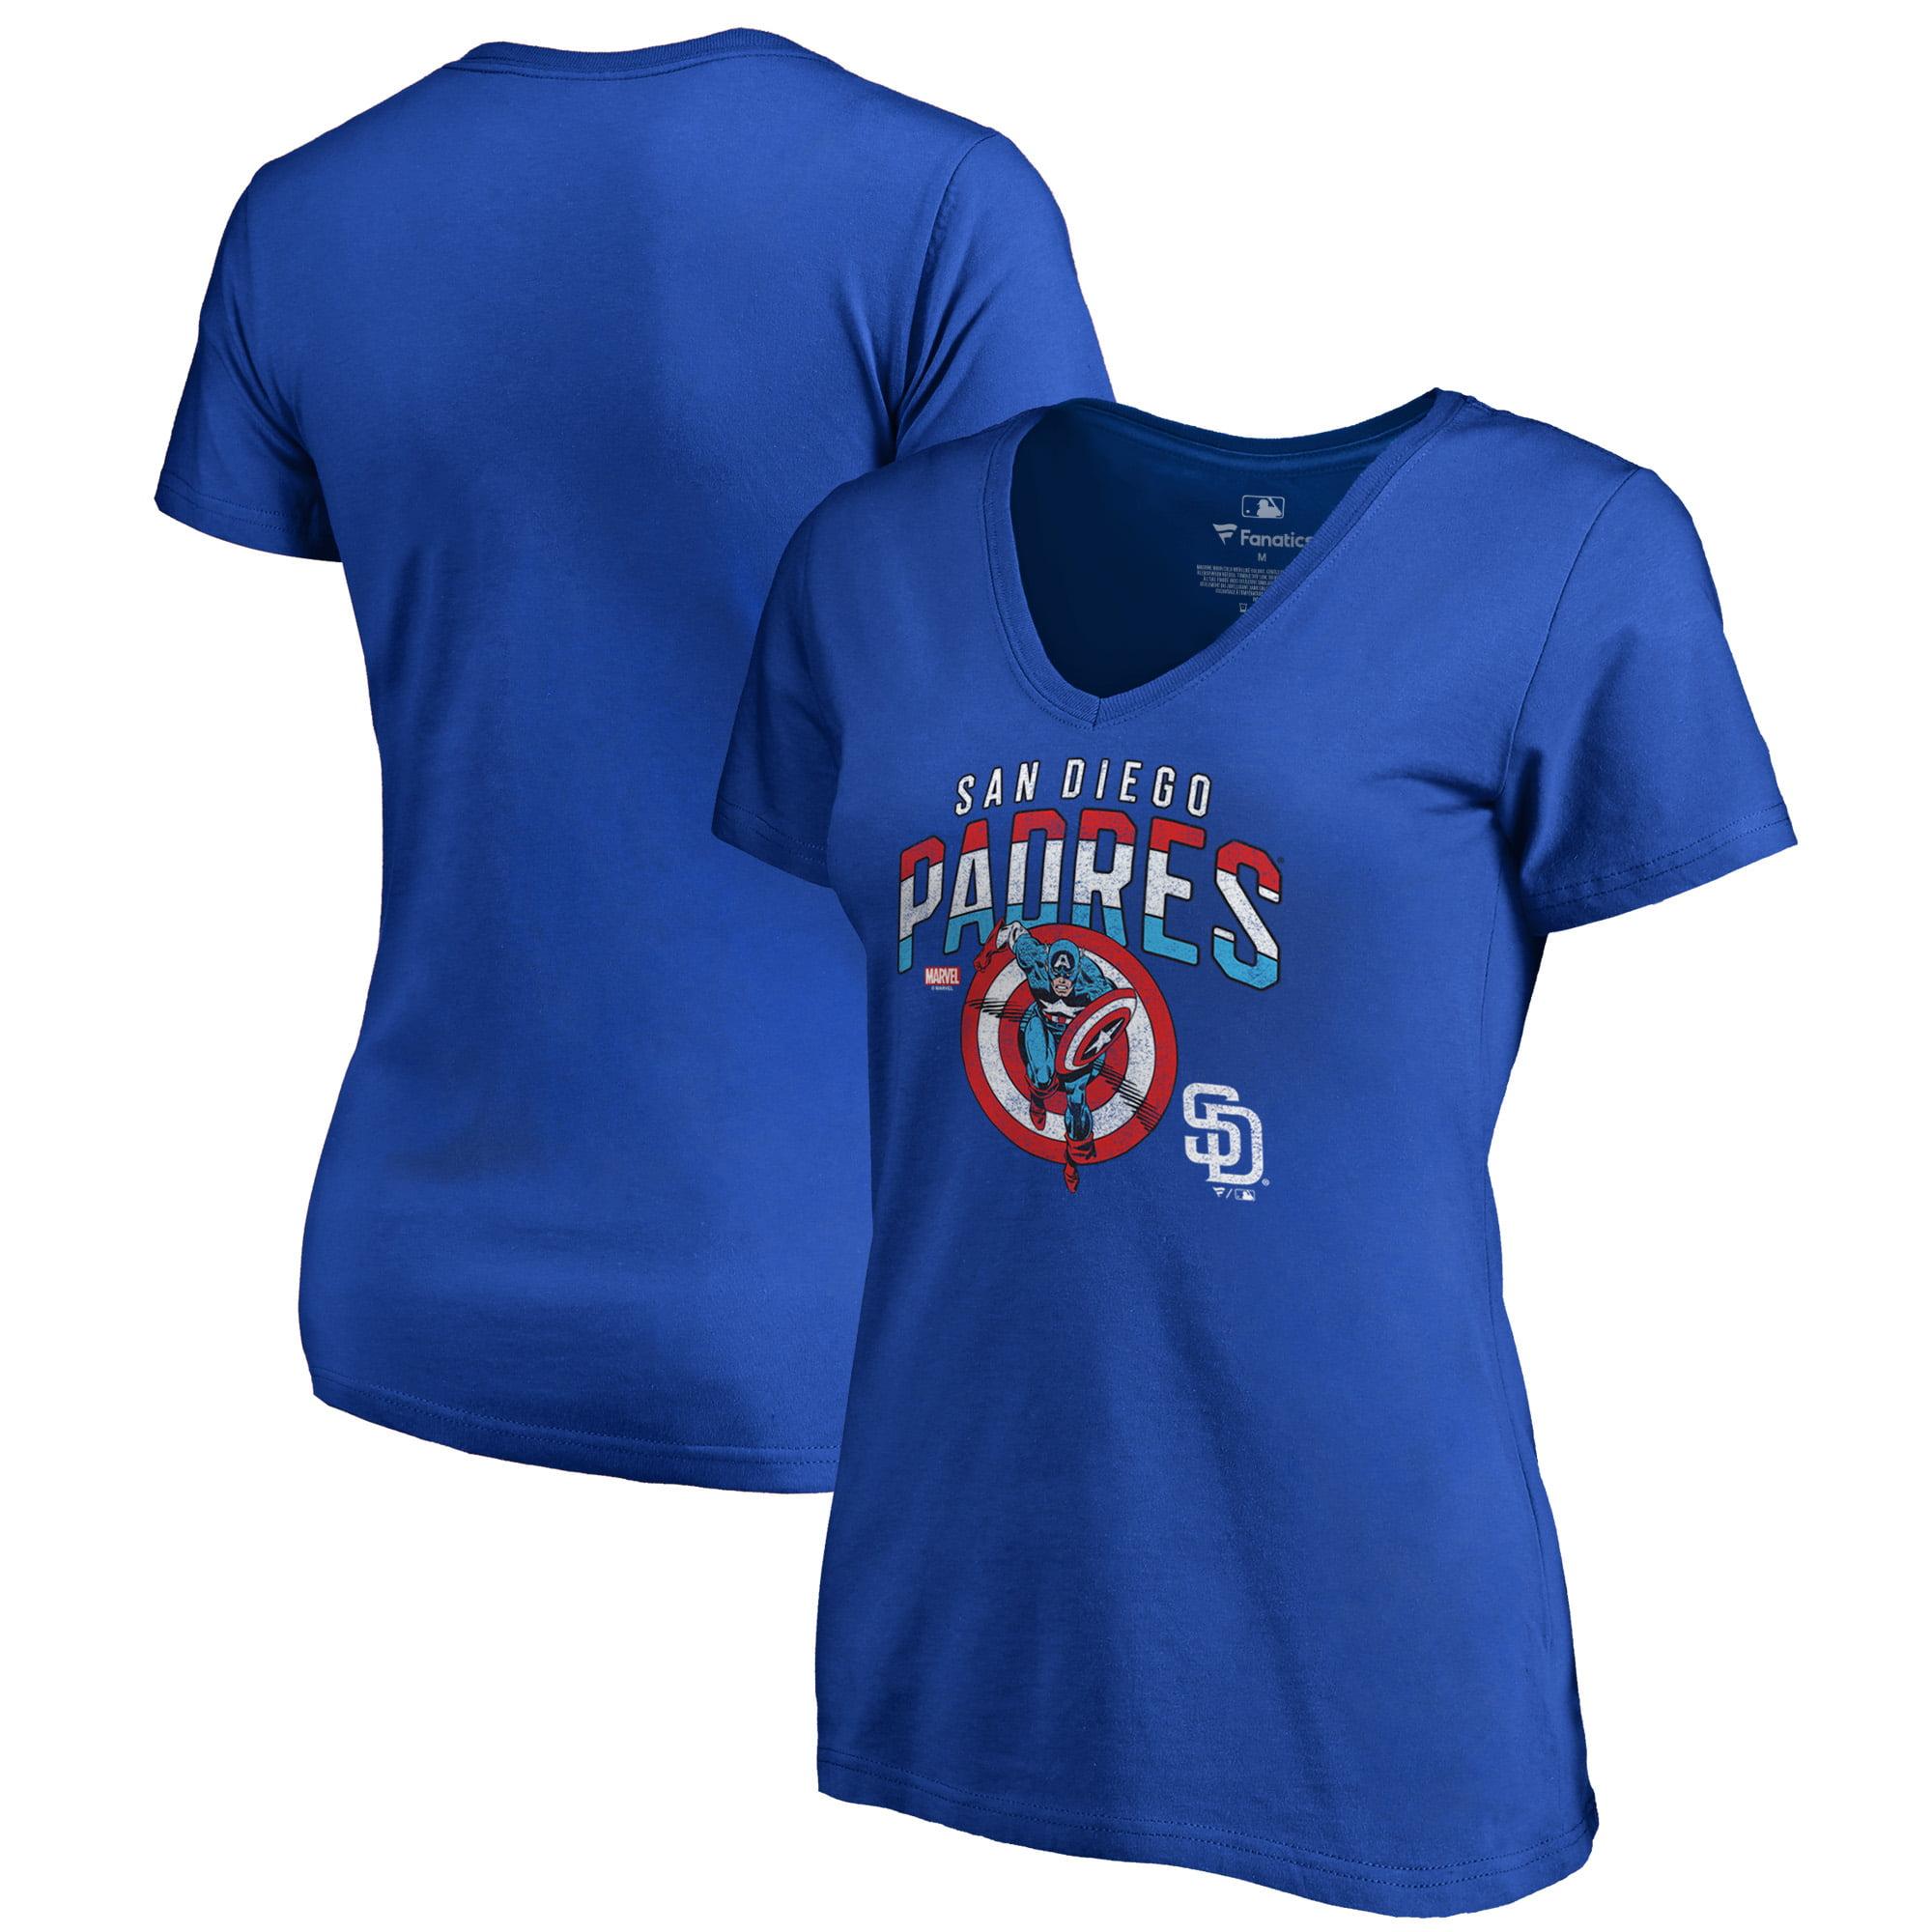 San Diego Padres Fanatics Branded Women's MLB Marvel Captain's Shield V-Neck T-Shirt - Royal